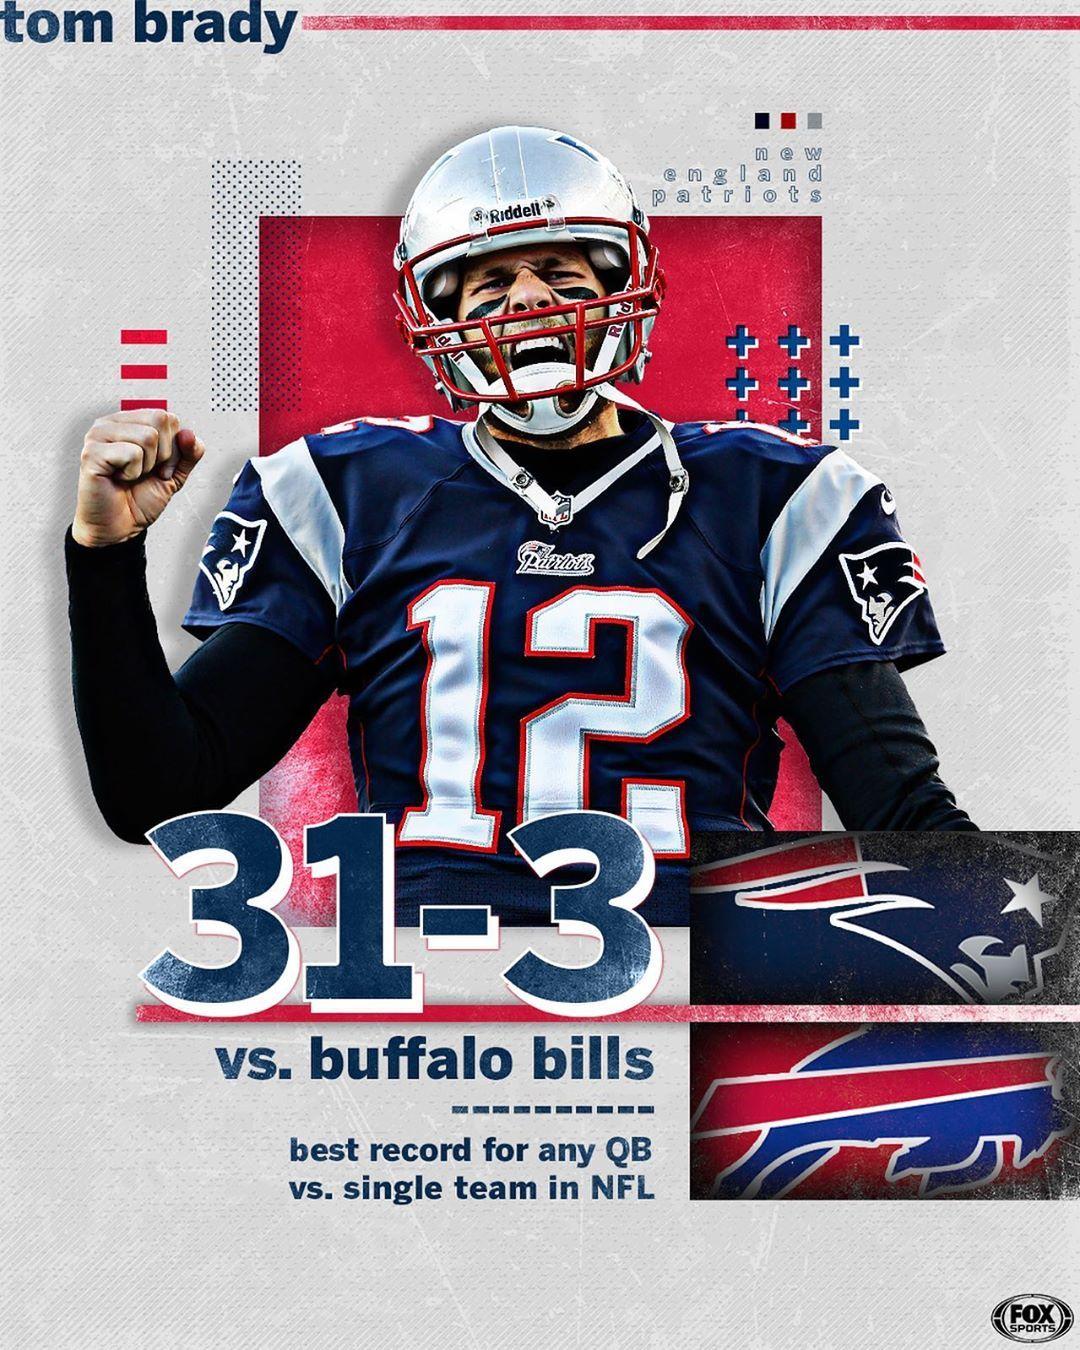 Tom Brady Is The Mayor Of Buffalo Tom Brady Funny Sports Memes Sports Memes